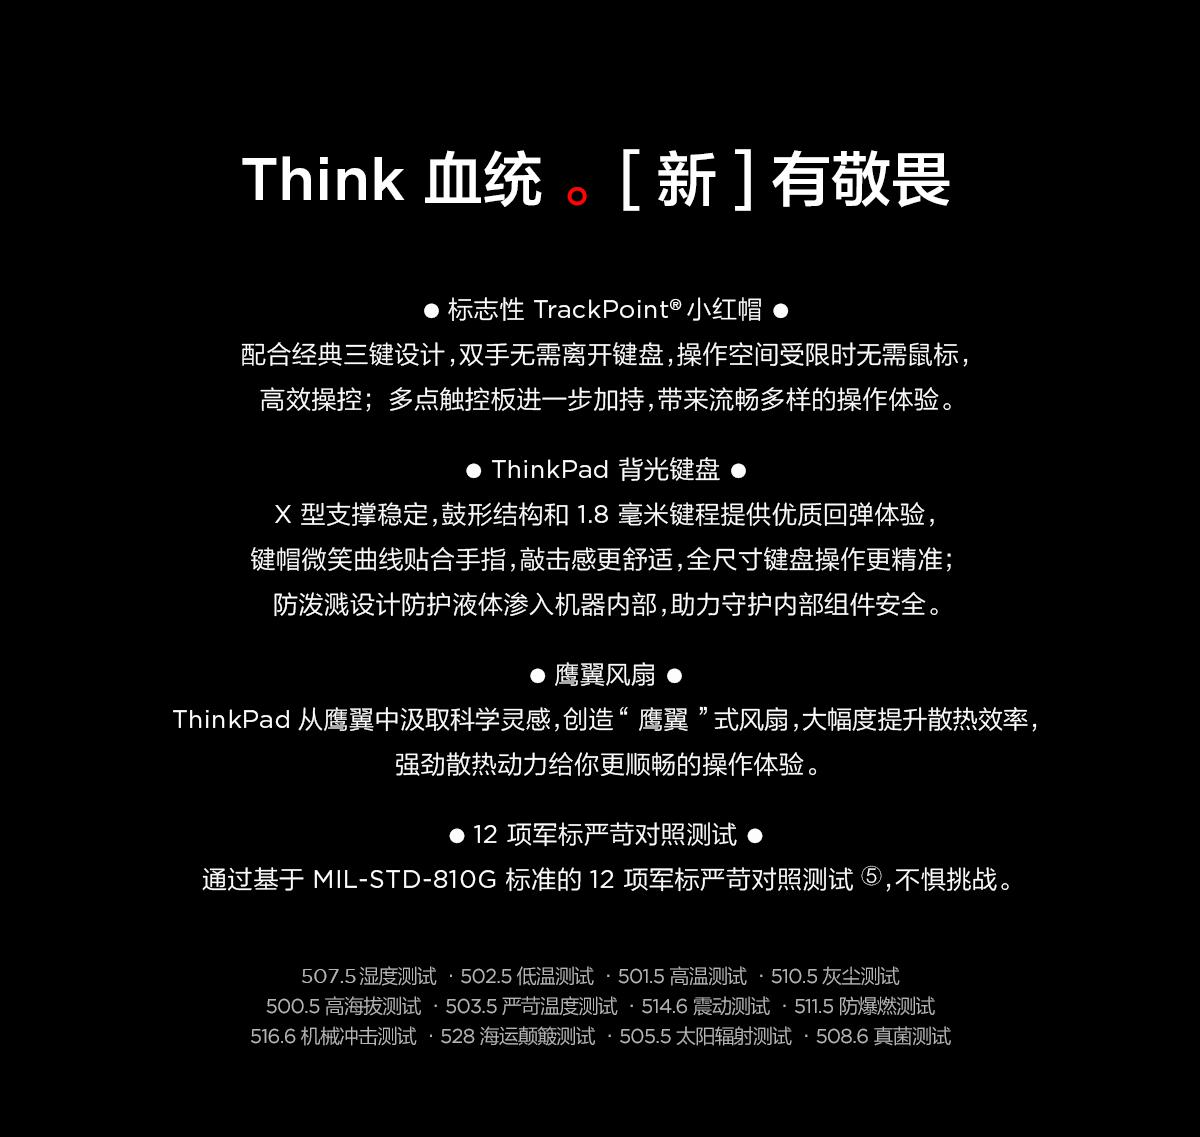 thinkpad p1 16